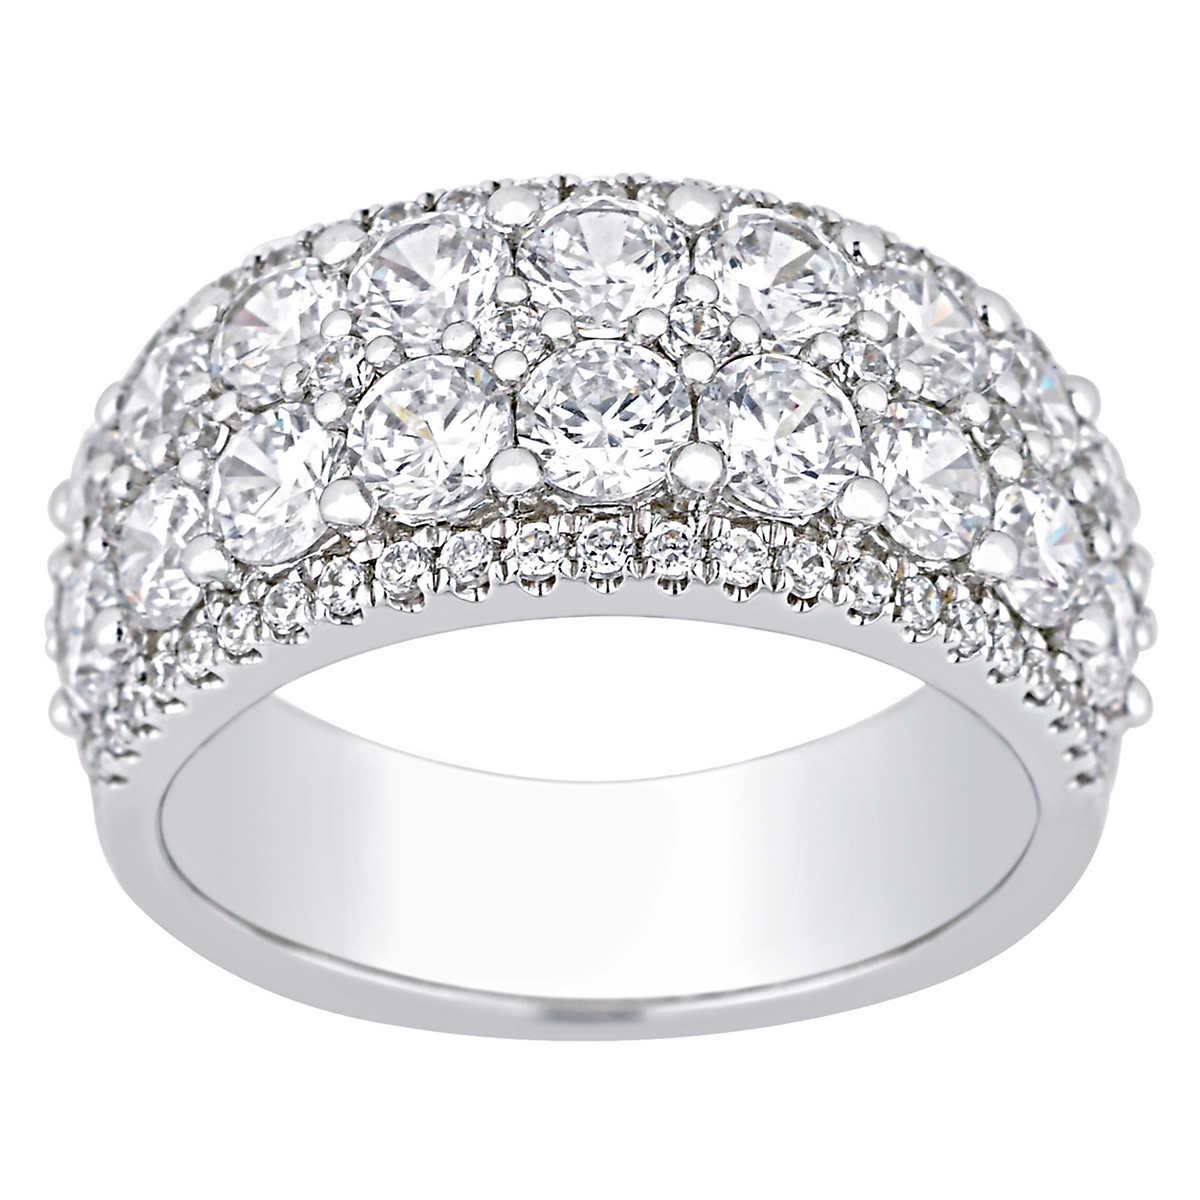 diamond bands platinum diamond wedding bands Round Brilliant 3 00 ctw VS2 Clarity I Color Diamond Platinum Band